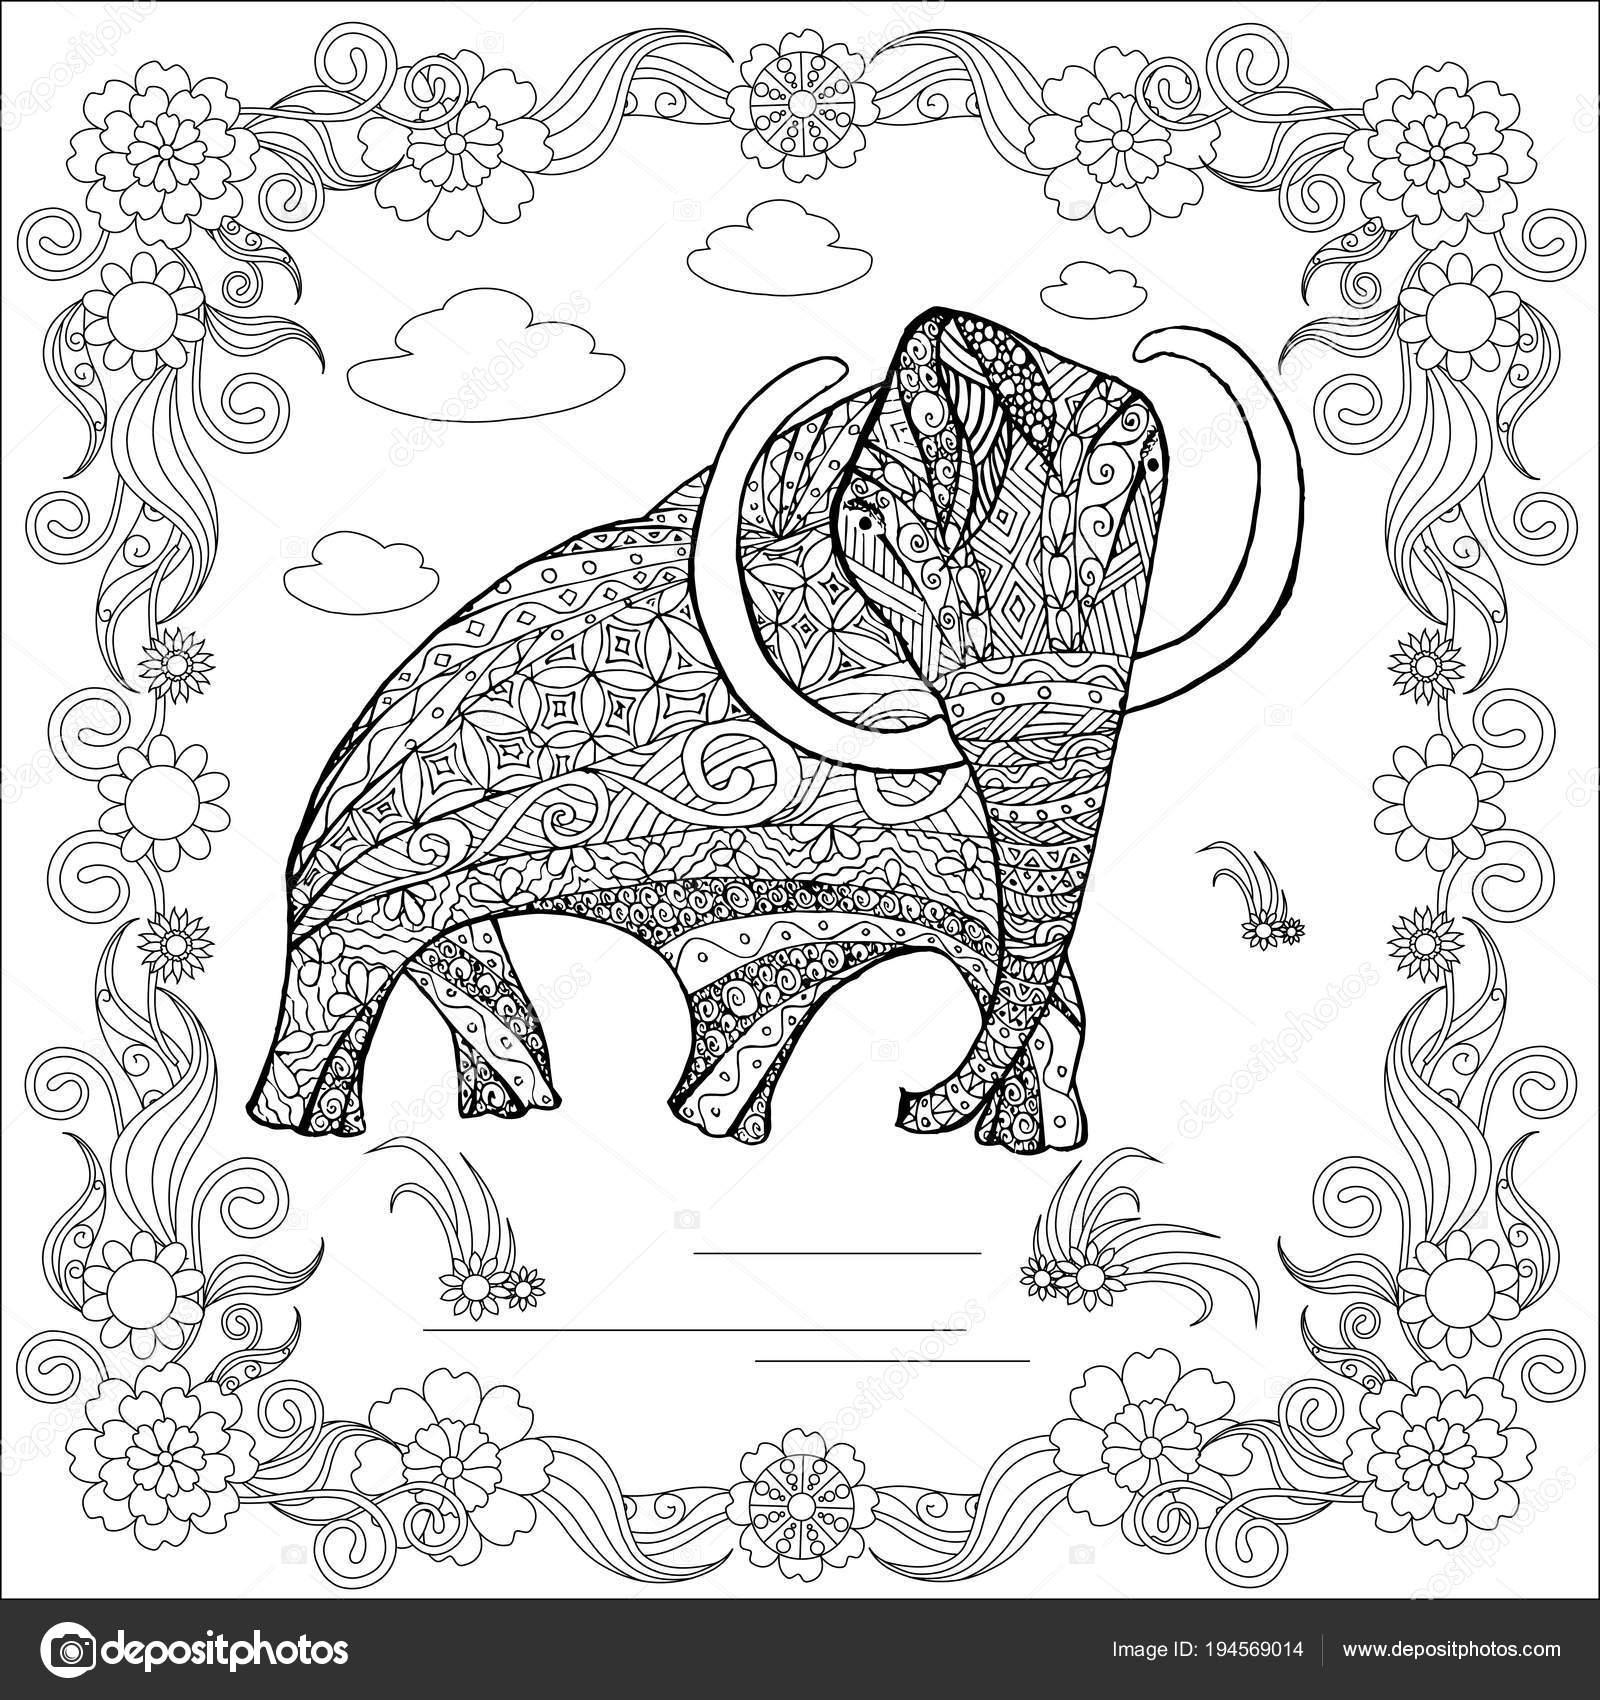 Imágenes Mamut Para Imprimir Mamut Bosquejo Monocromo Estilo